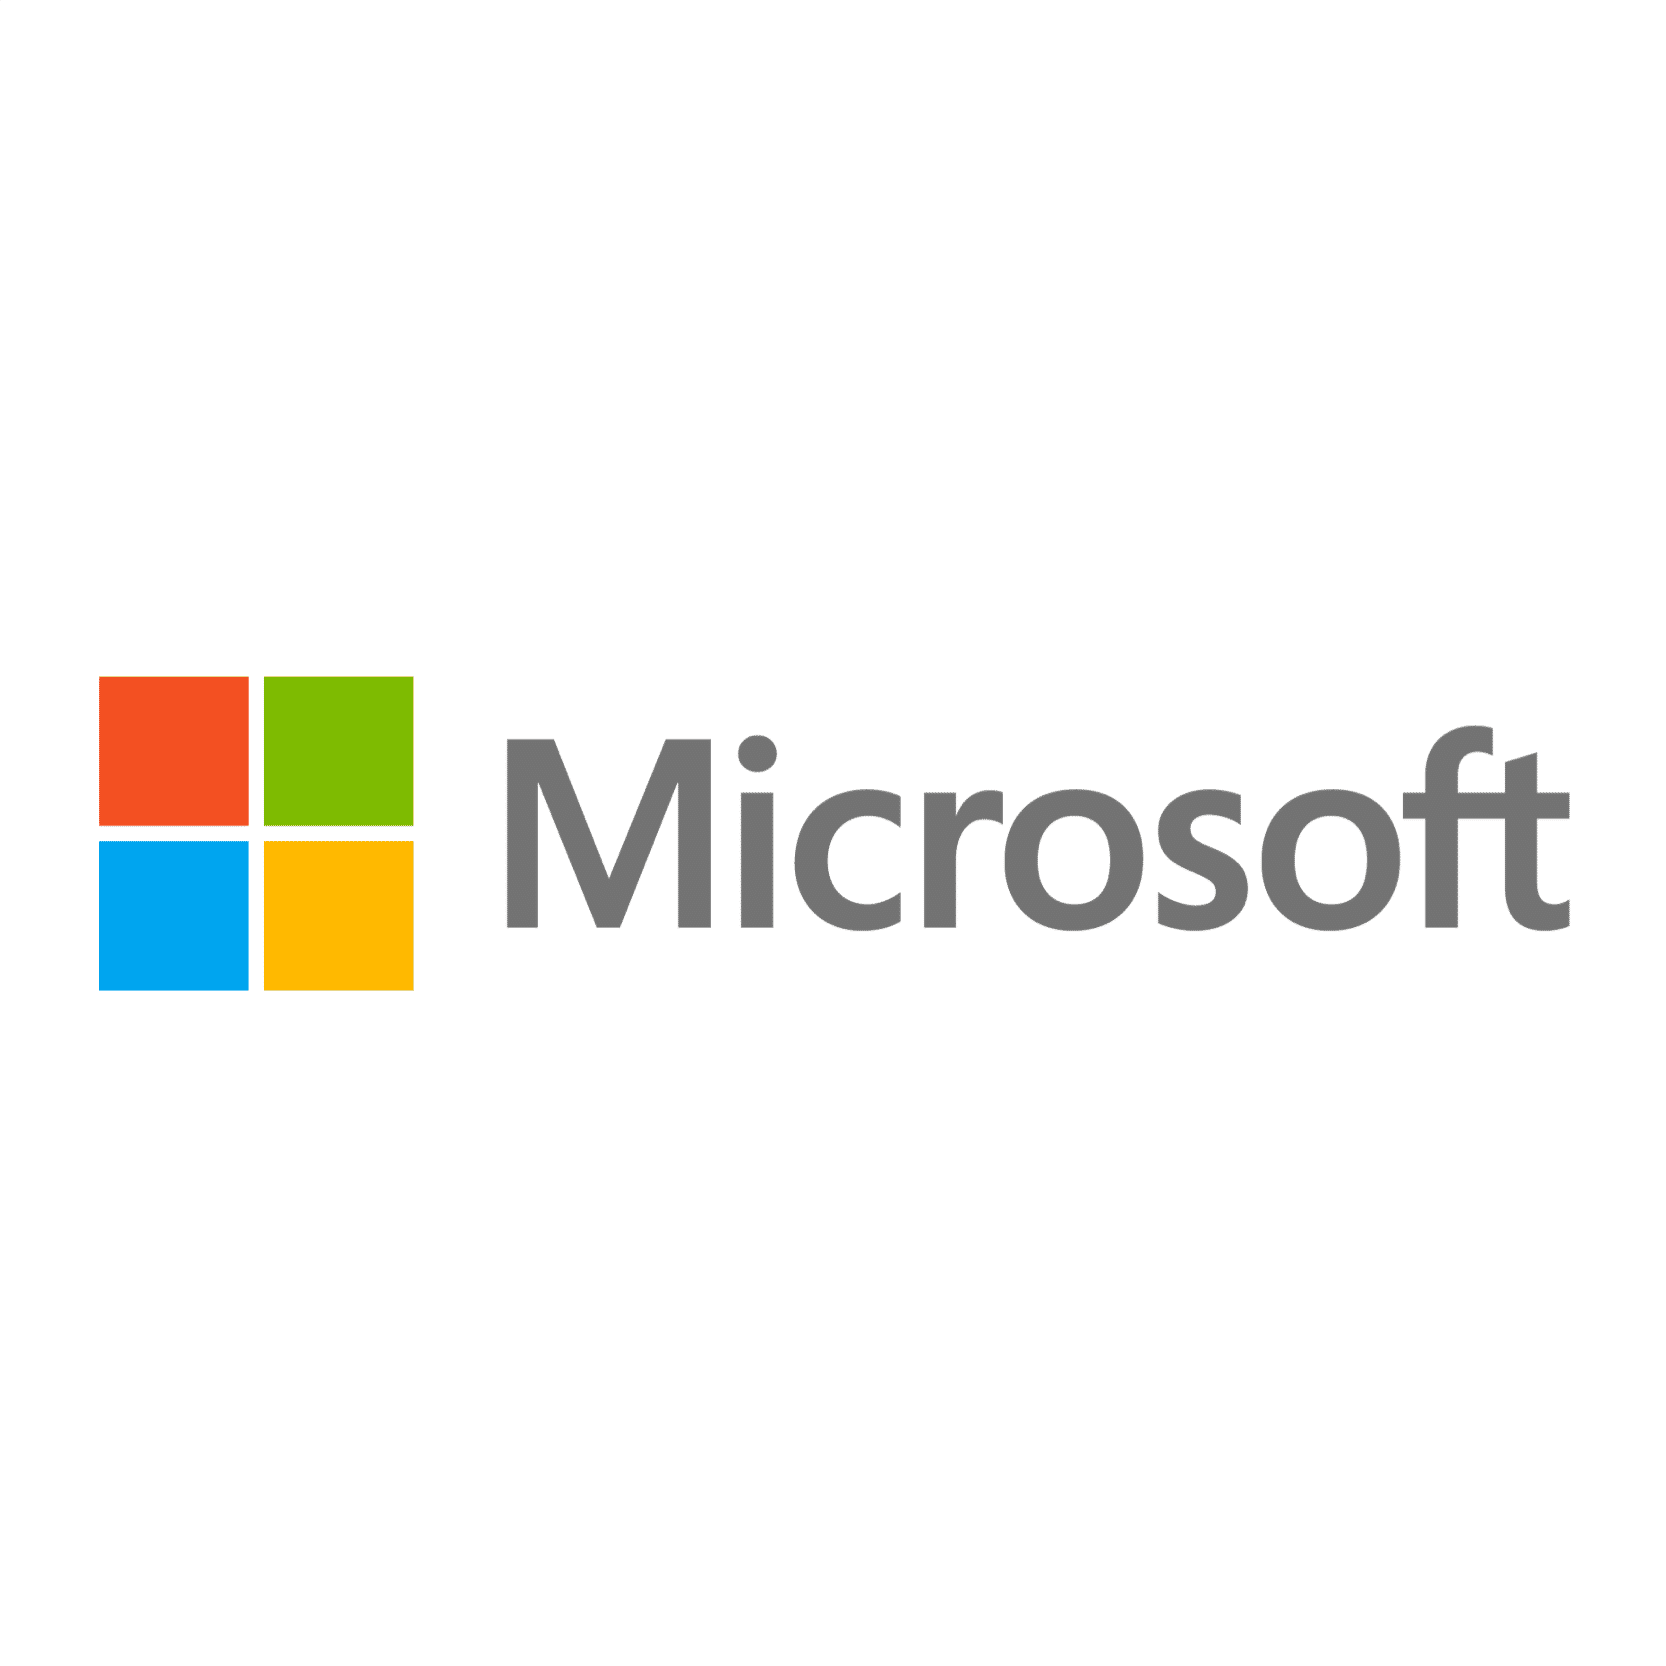 Download Microsoft Windows 10 IoT Core - Microsoft Windows PNG